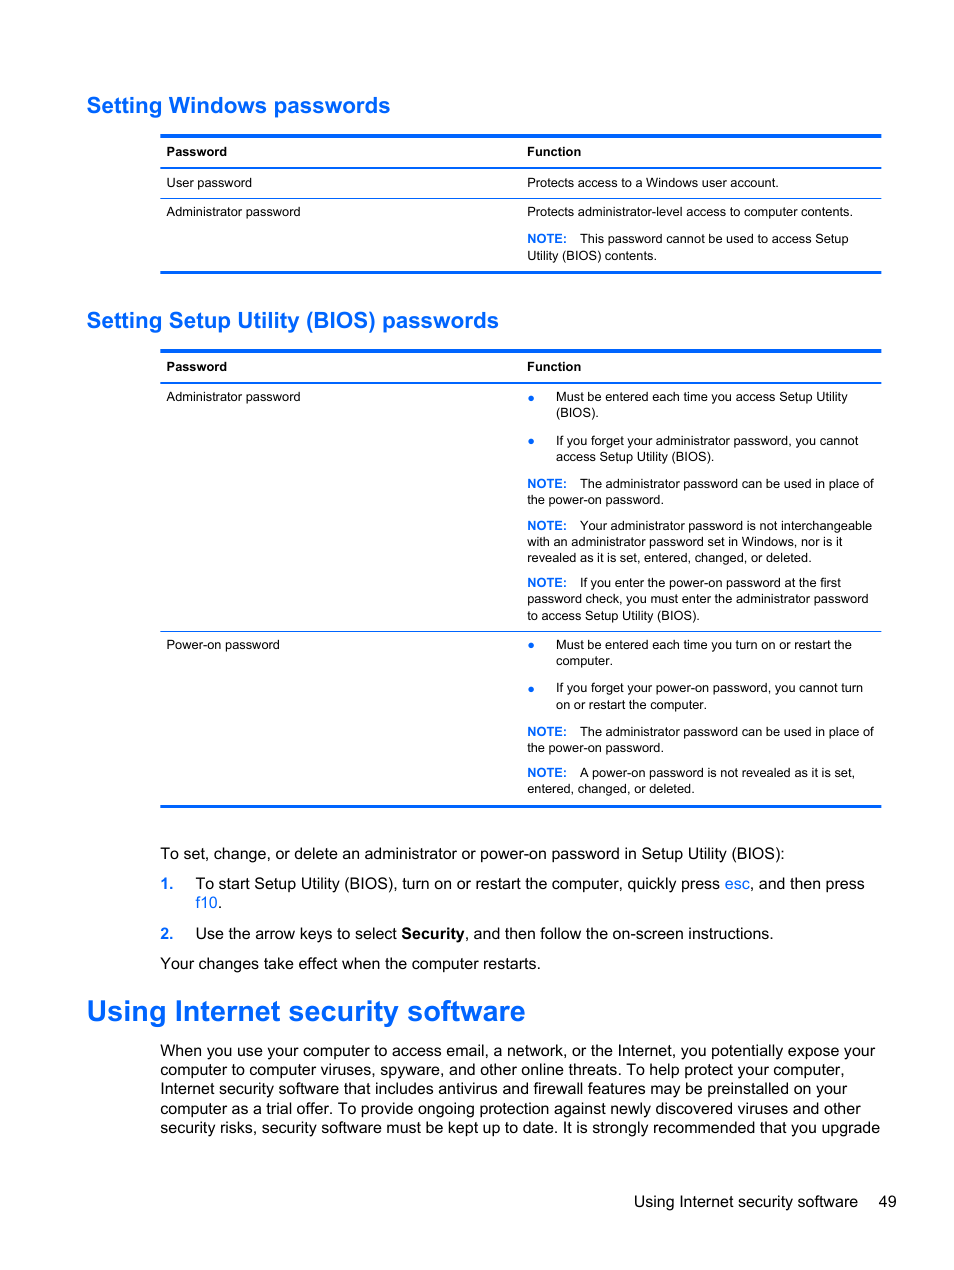 Setting windows passwords, Setting setup utility (bios) passwords